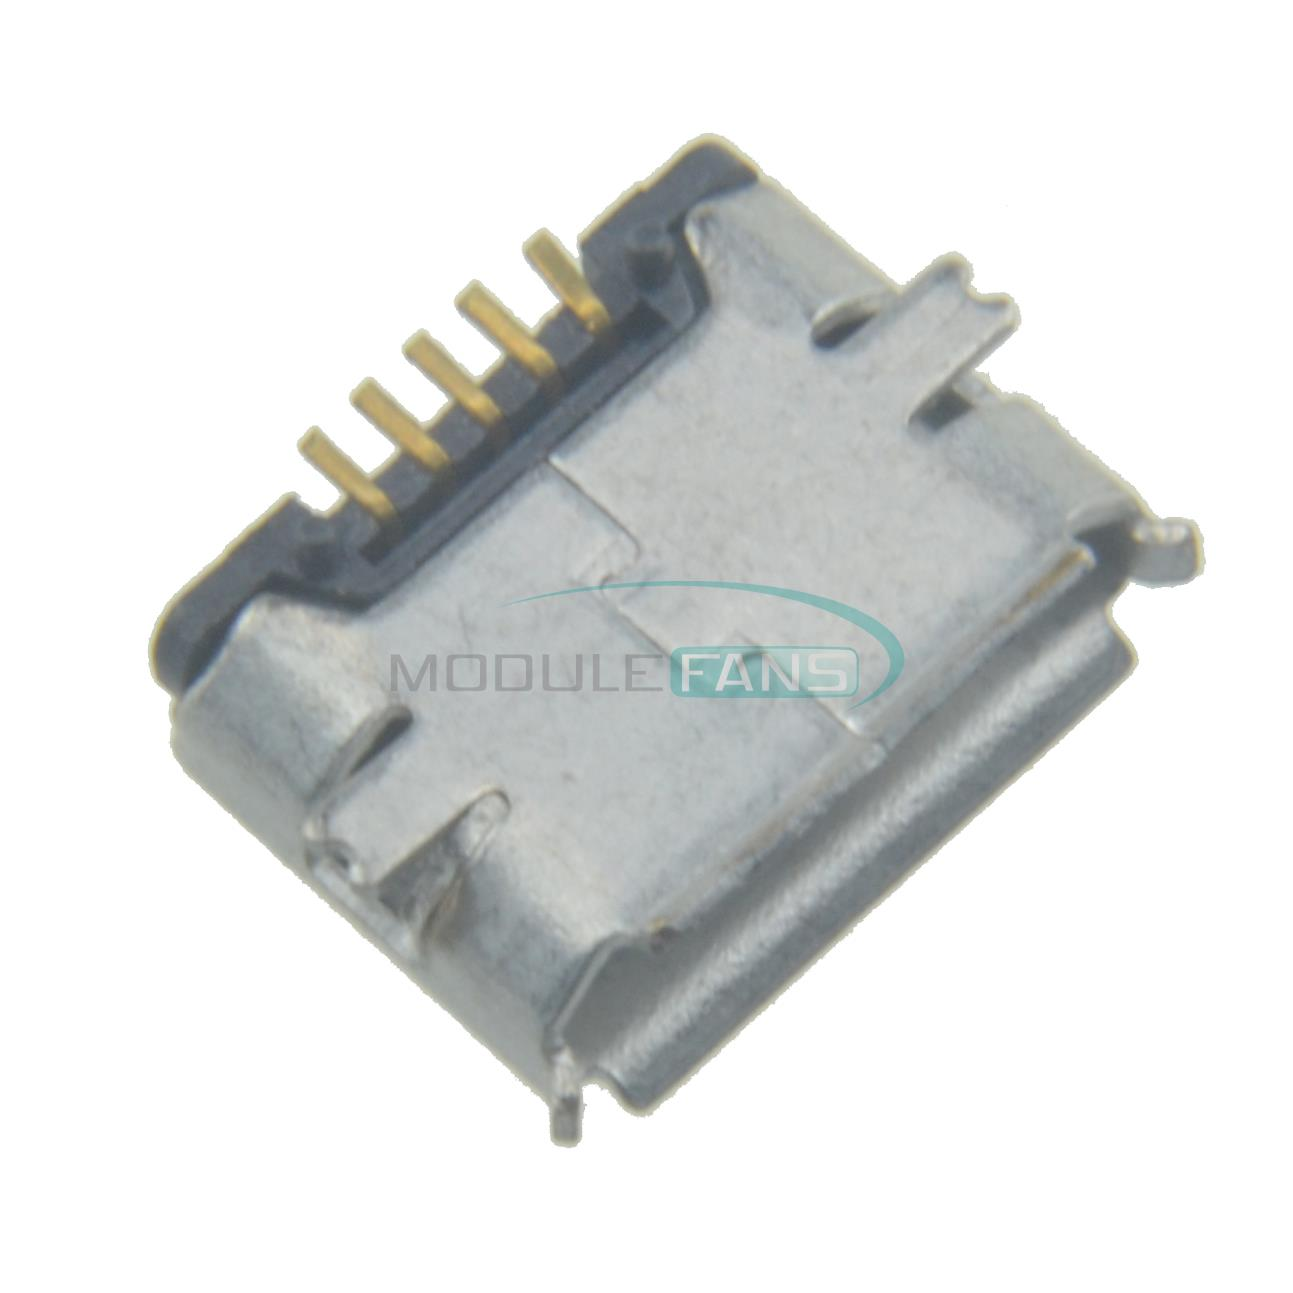 Гаджет  10Pcs Micro USB Type B Female 5Pin SMT Socket Jack Connectors Port PCB Board None Электронные компоненты и материалы